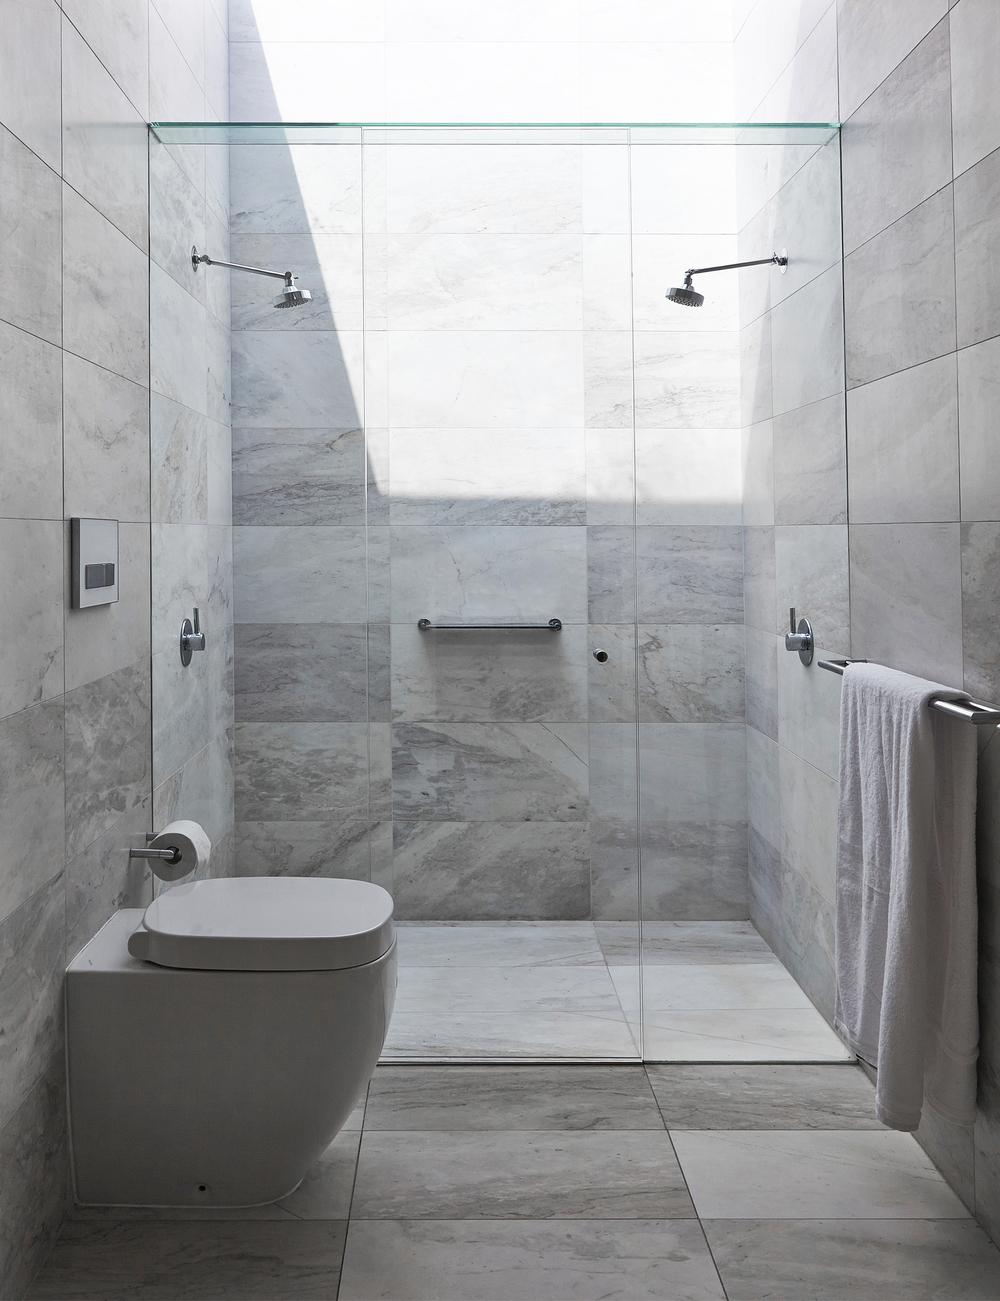 Fraser street bathroom by Chamberlain Architects